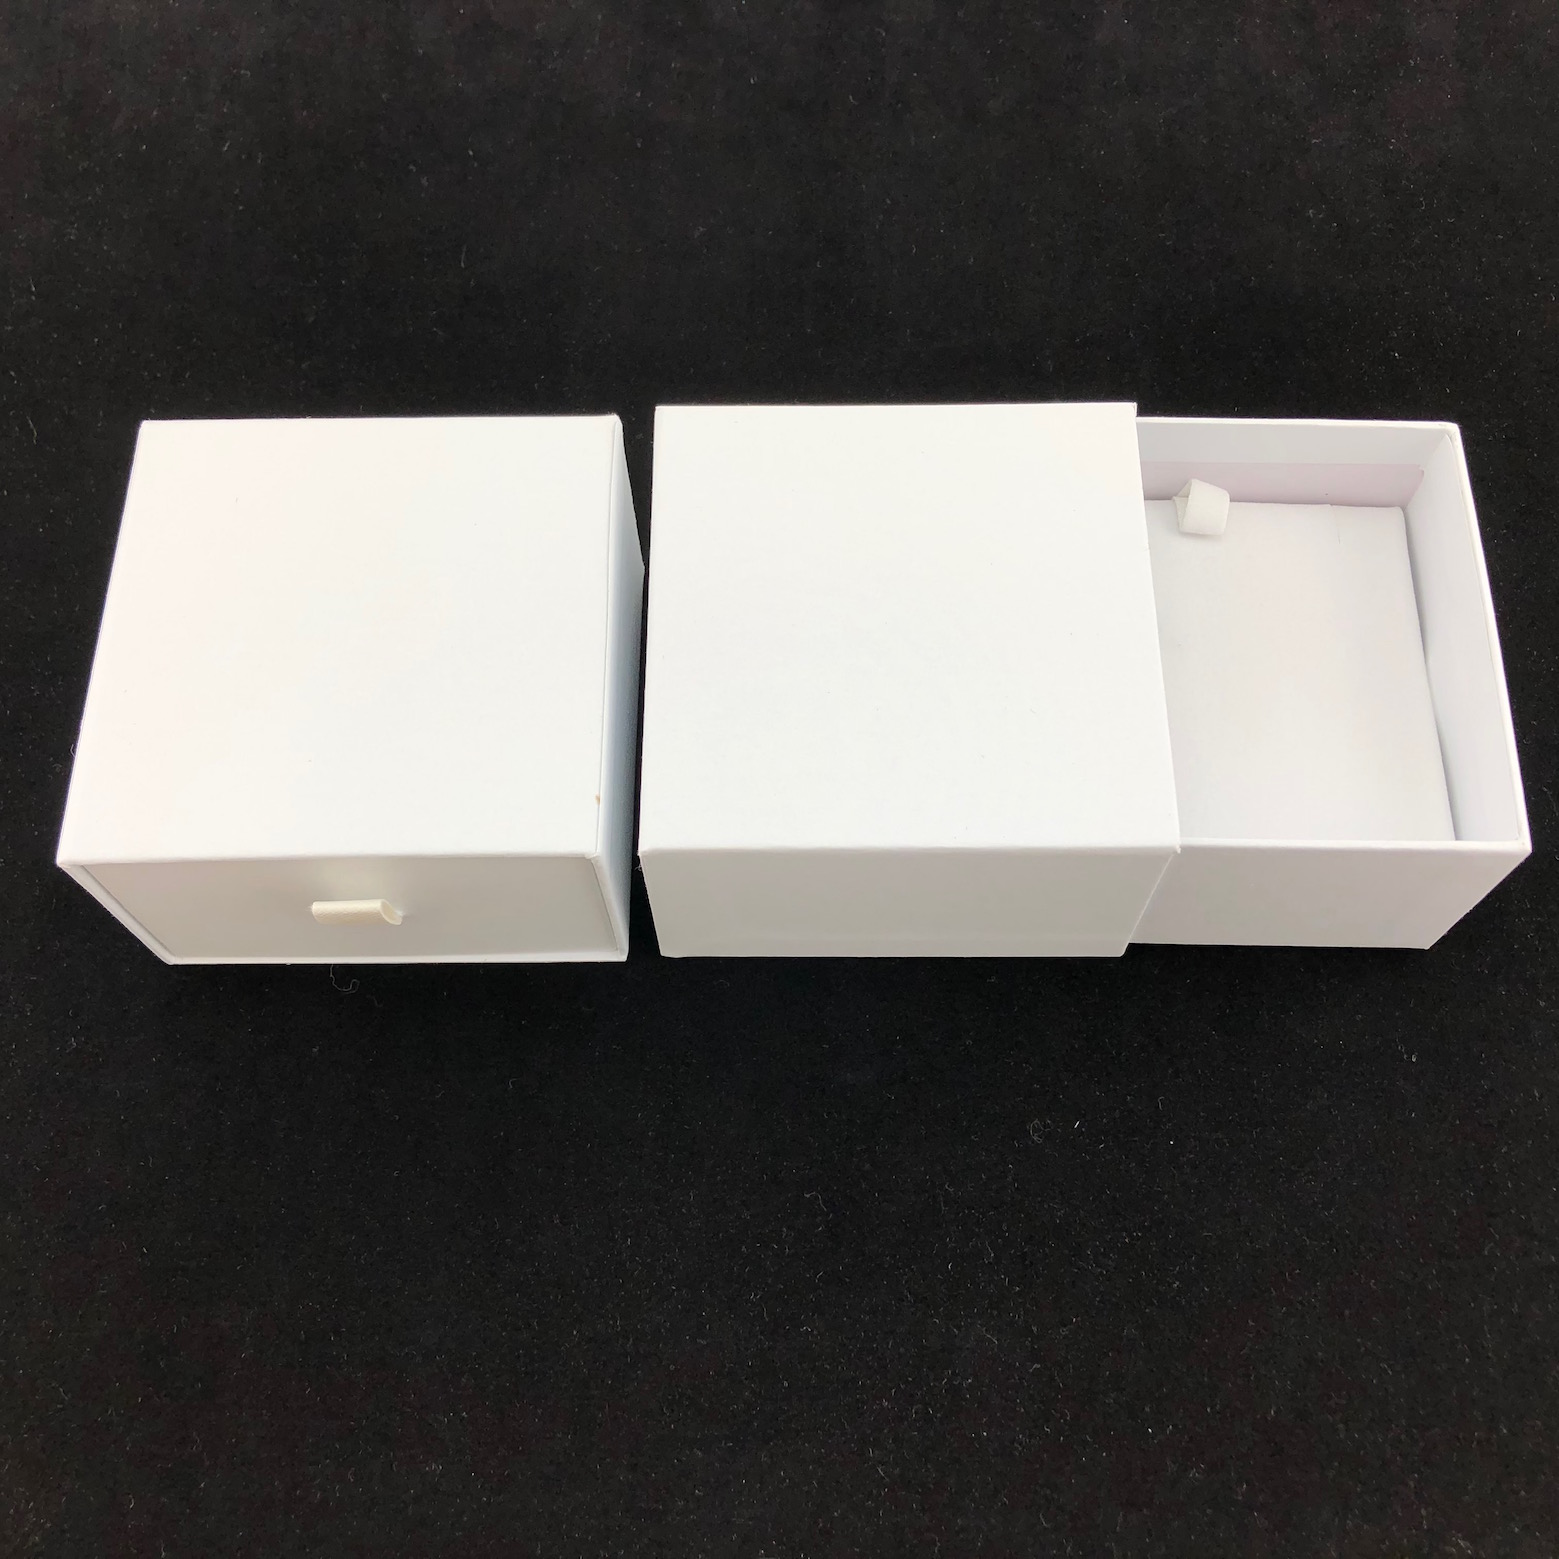 White Vogue Bangle Box with Pillow